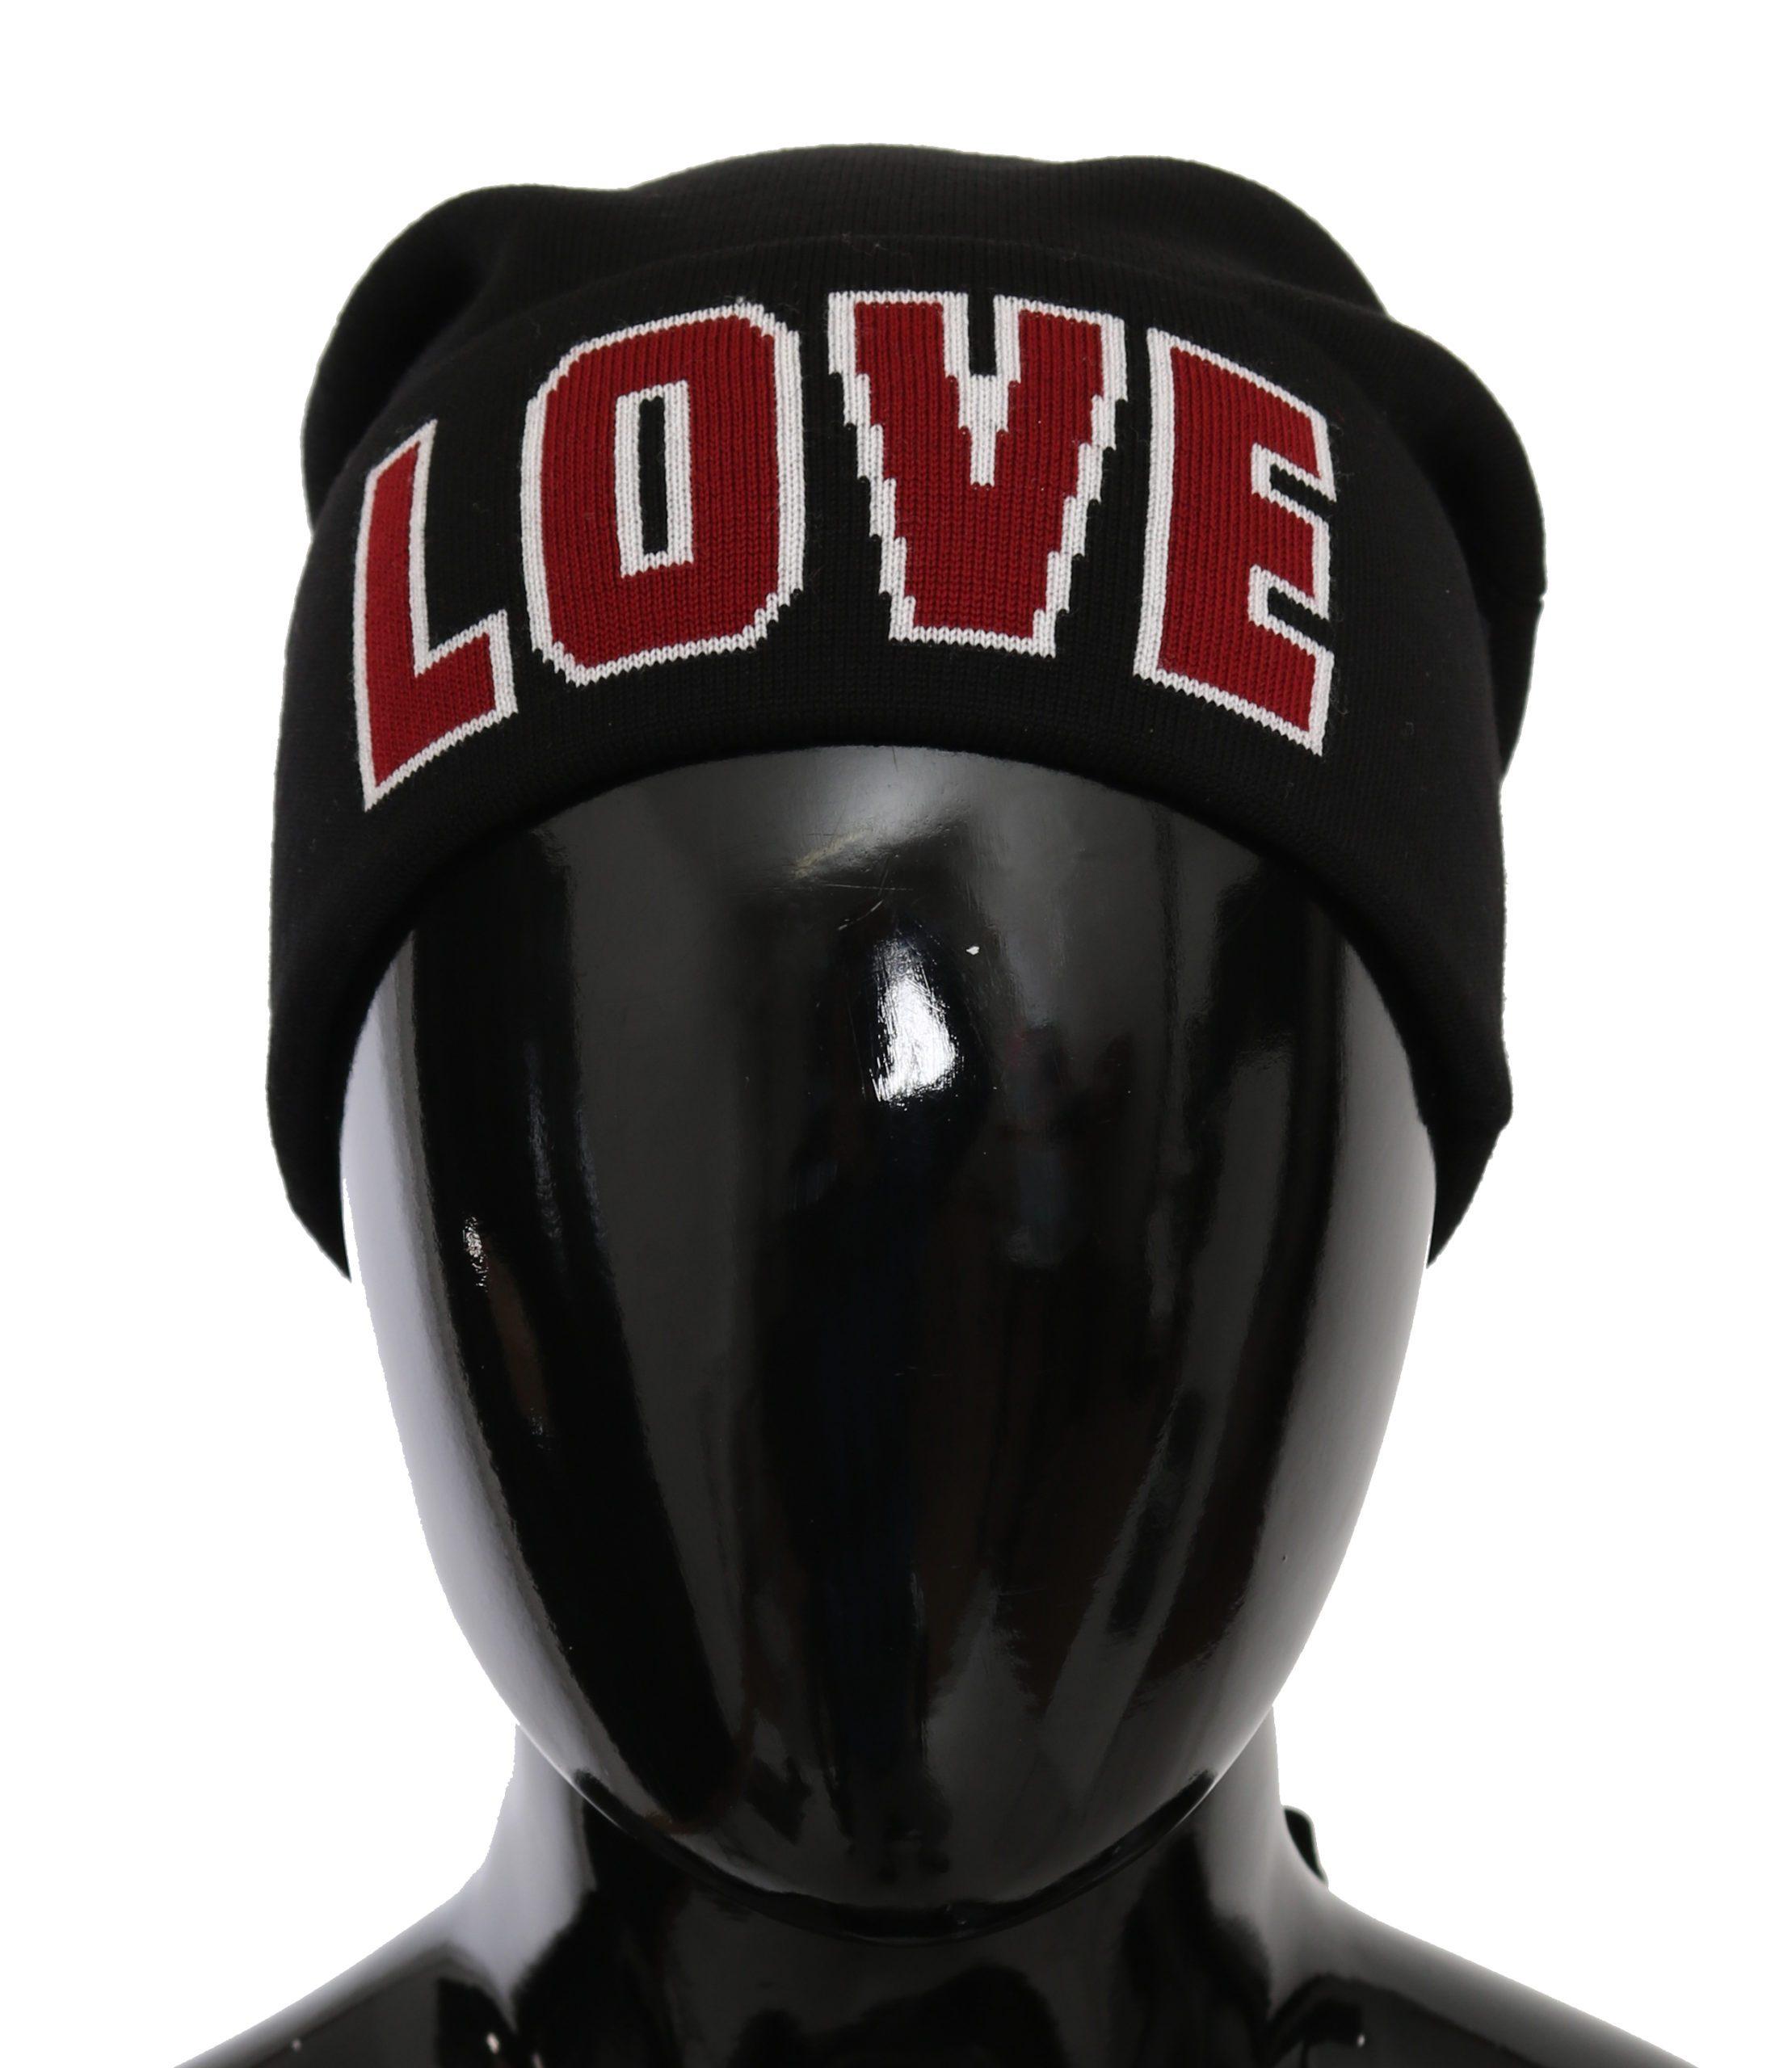 Dolce & Gabbana Men's Love Knitted Virgin Wool Hat Black HAT9054